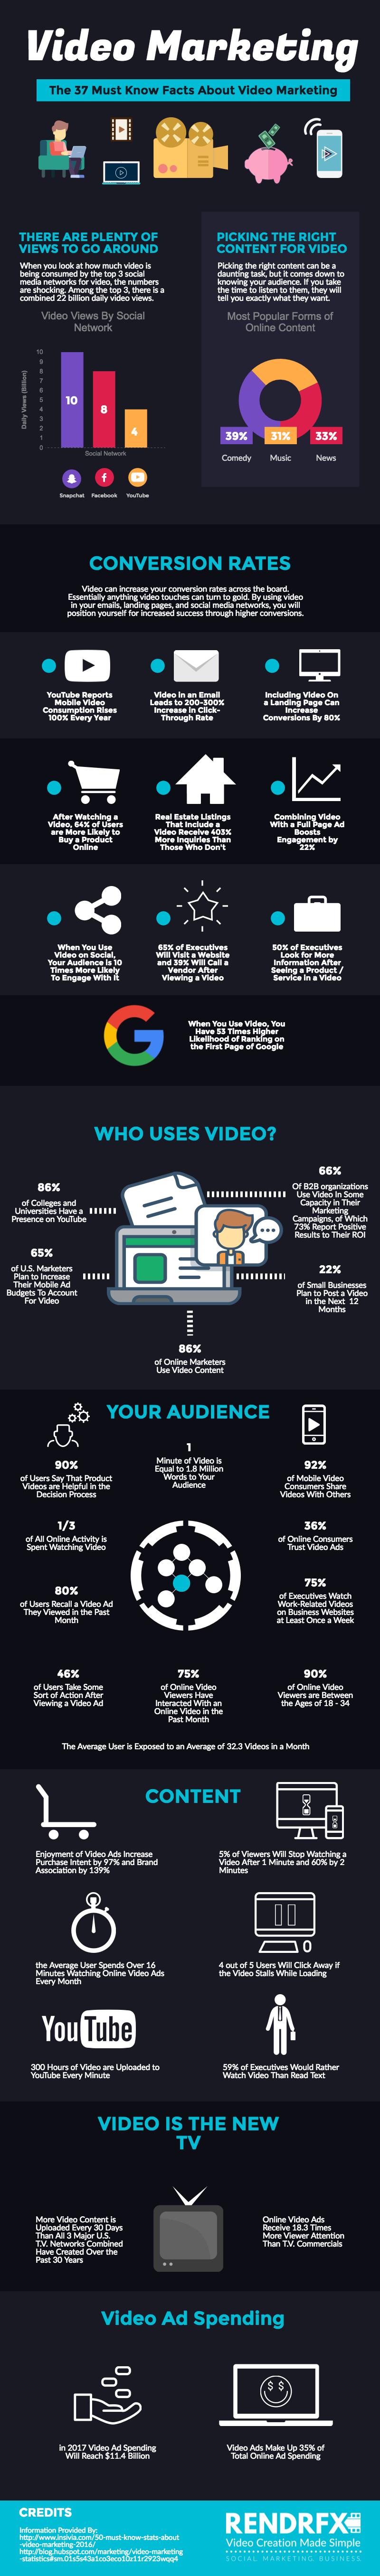 37 Key Statistics for Video Marketing - Infographic